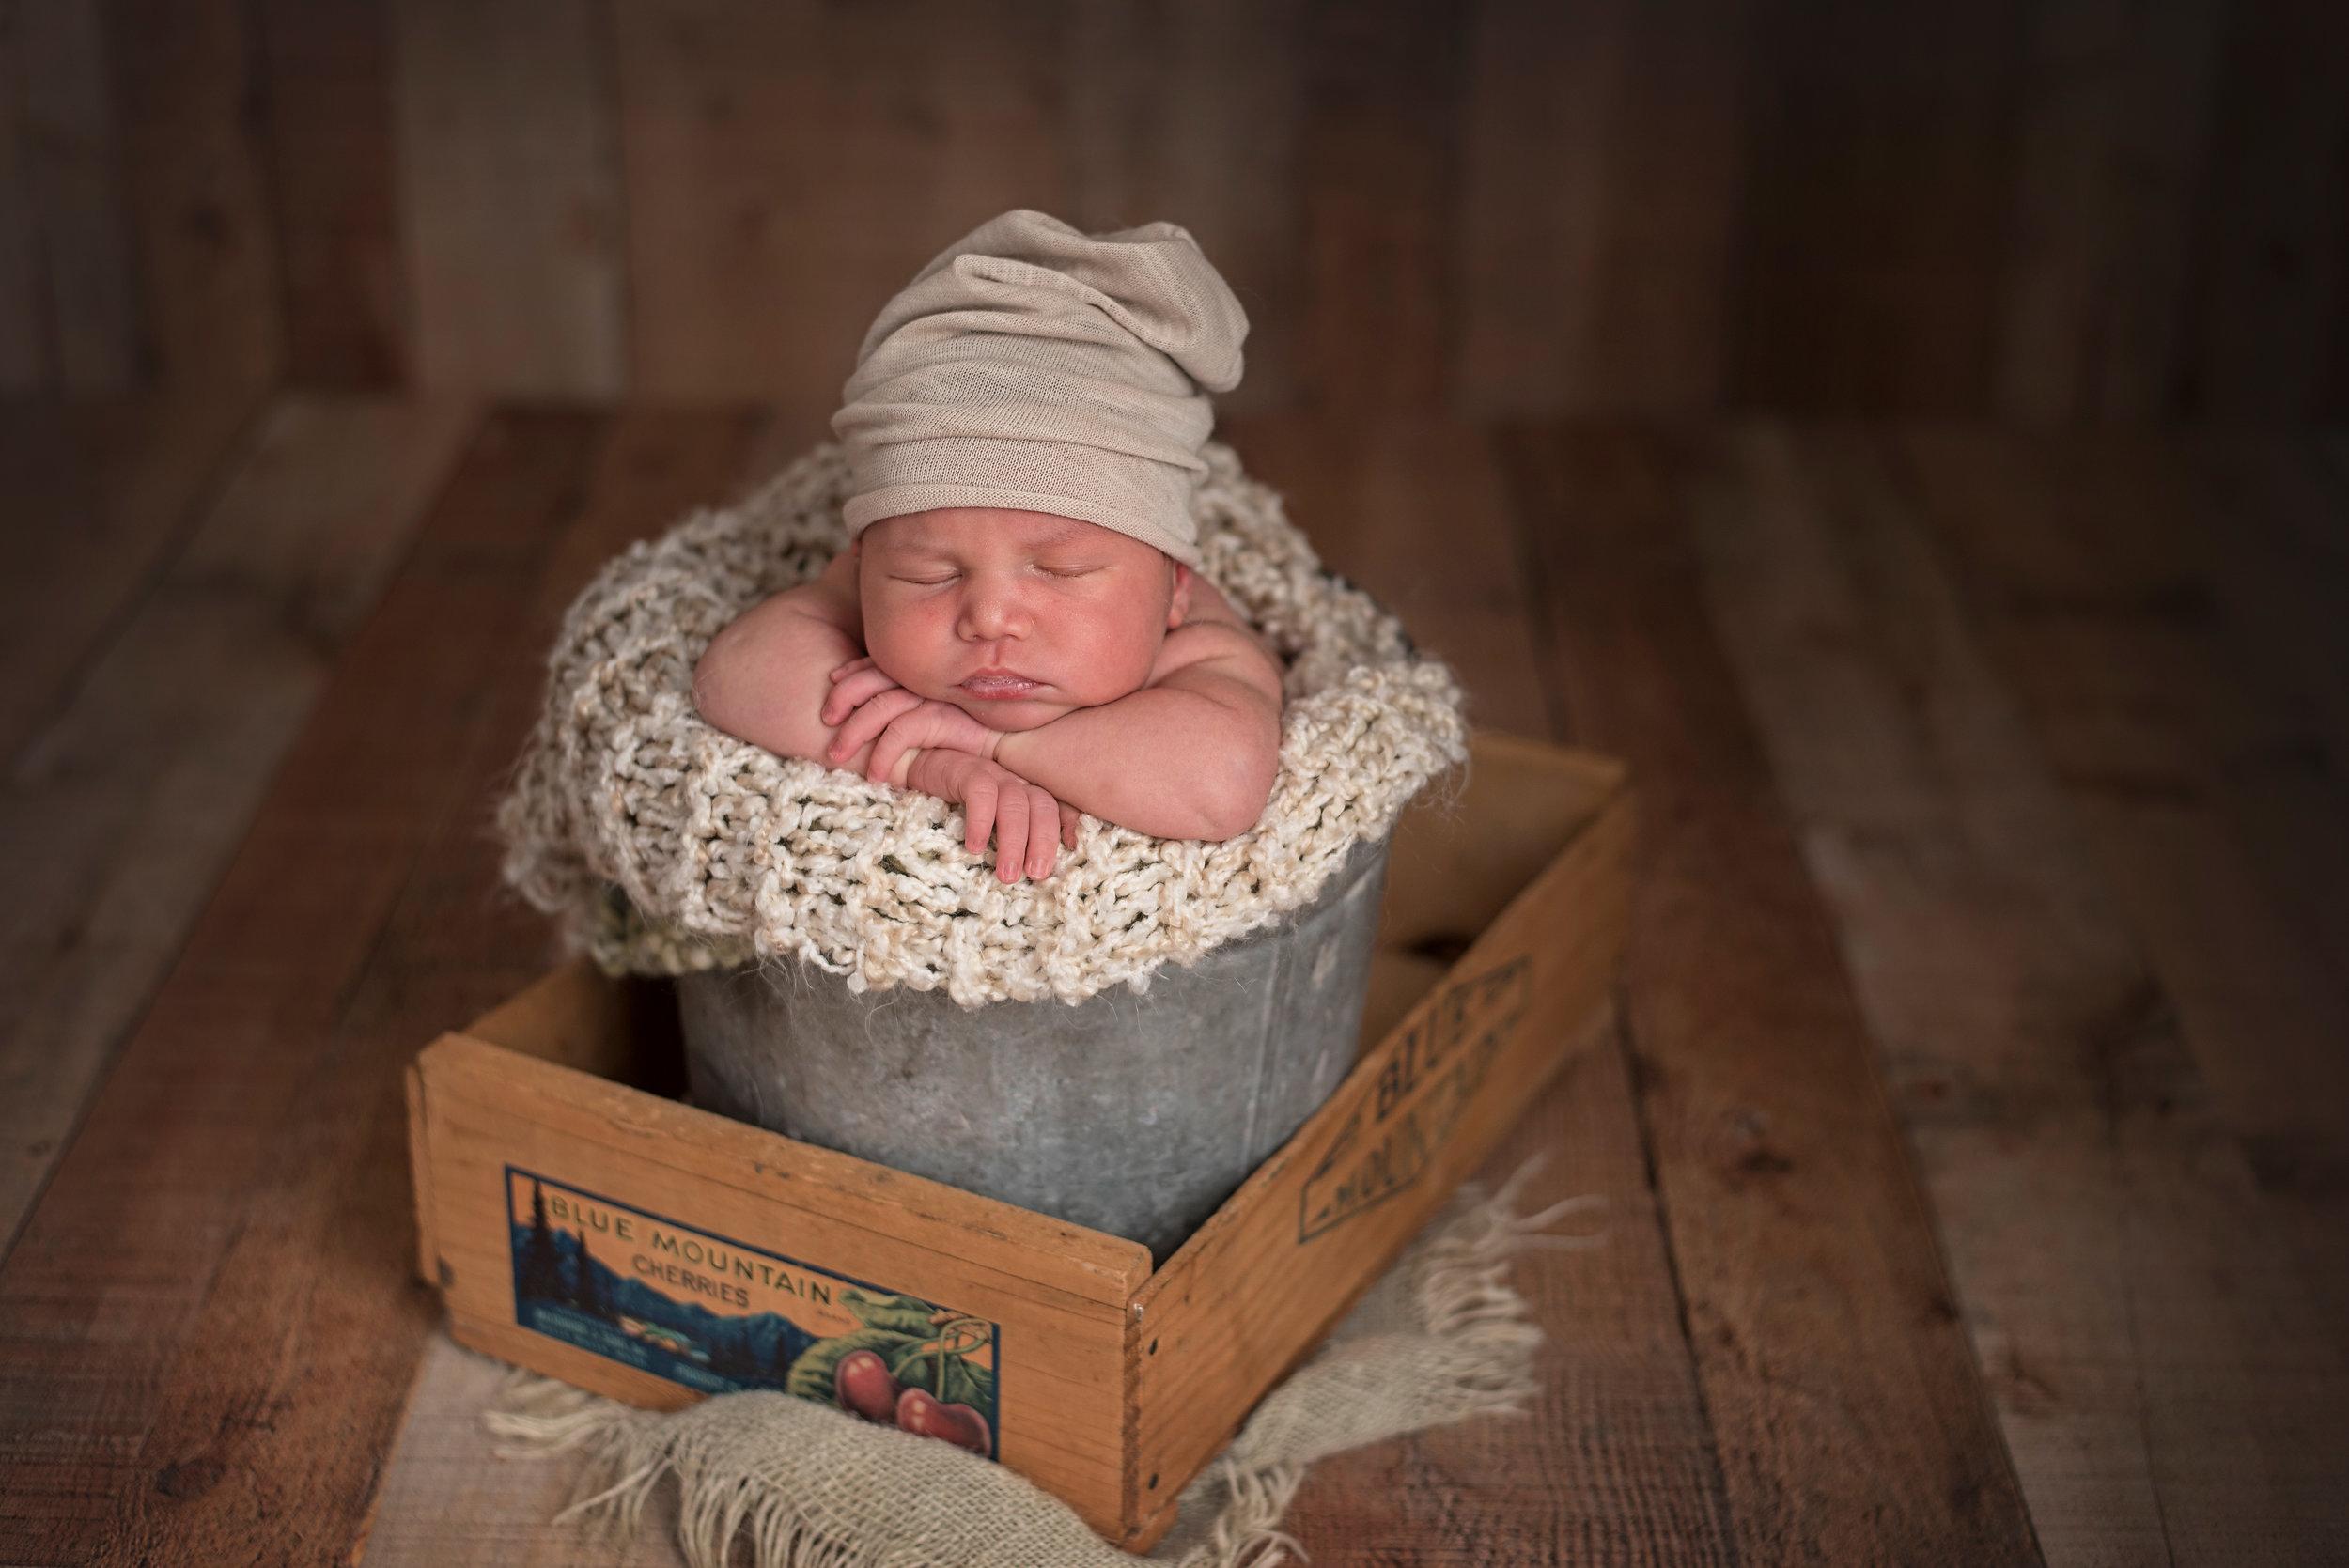 Lonsdale_Newborn_Photographer8.jpg